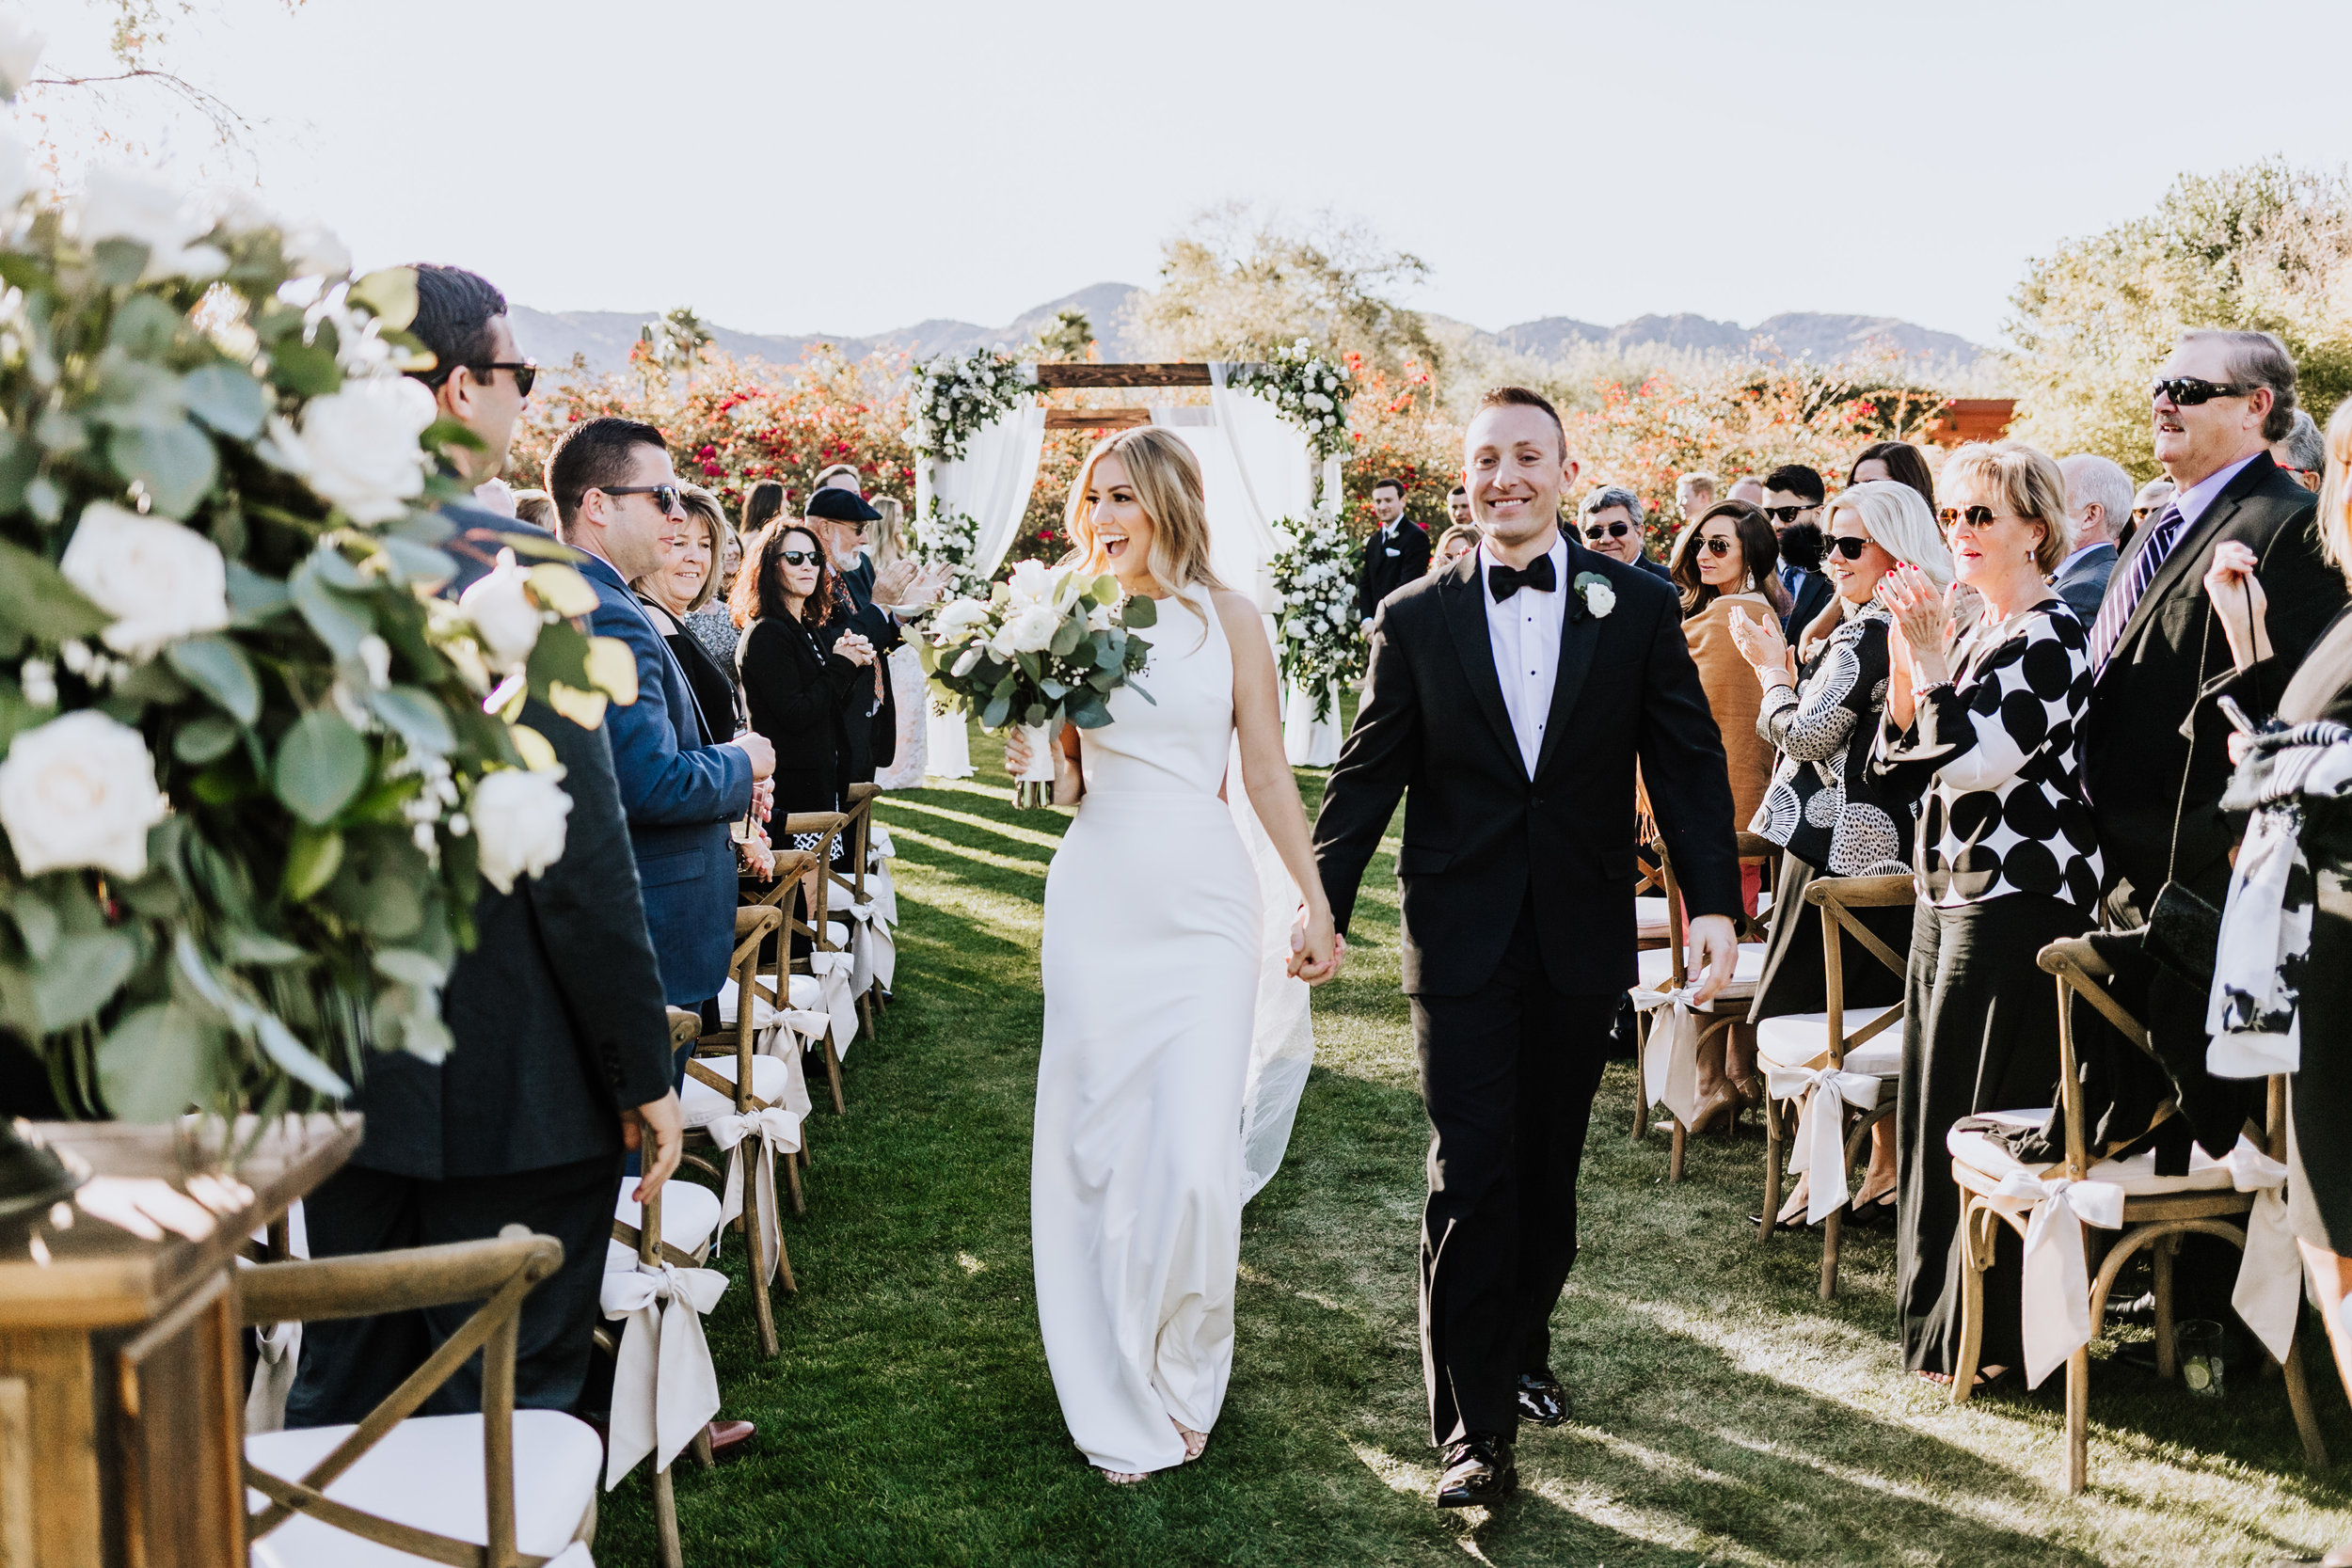 Lauren + Hartley - BACKYARD WEDDING